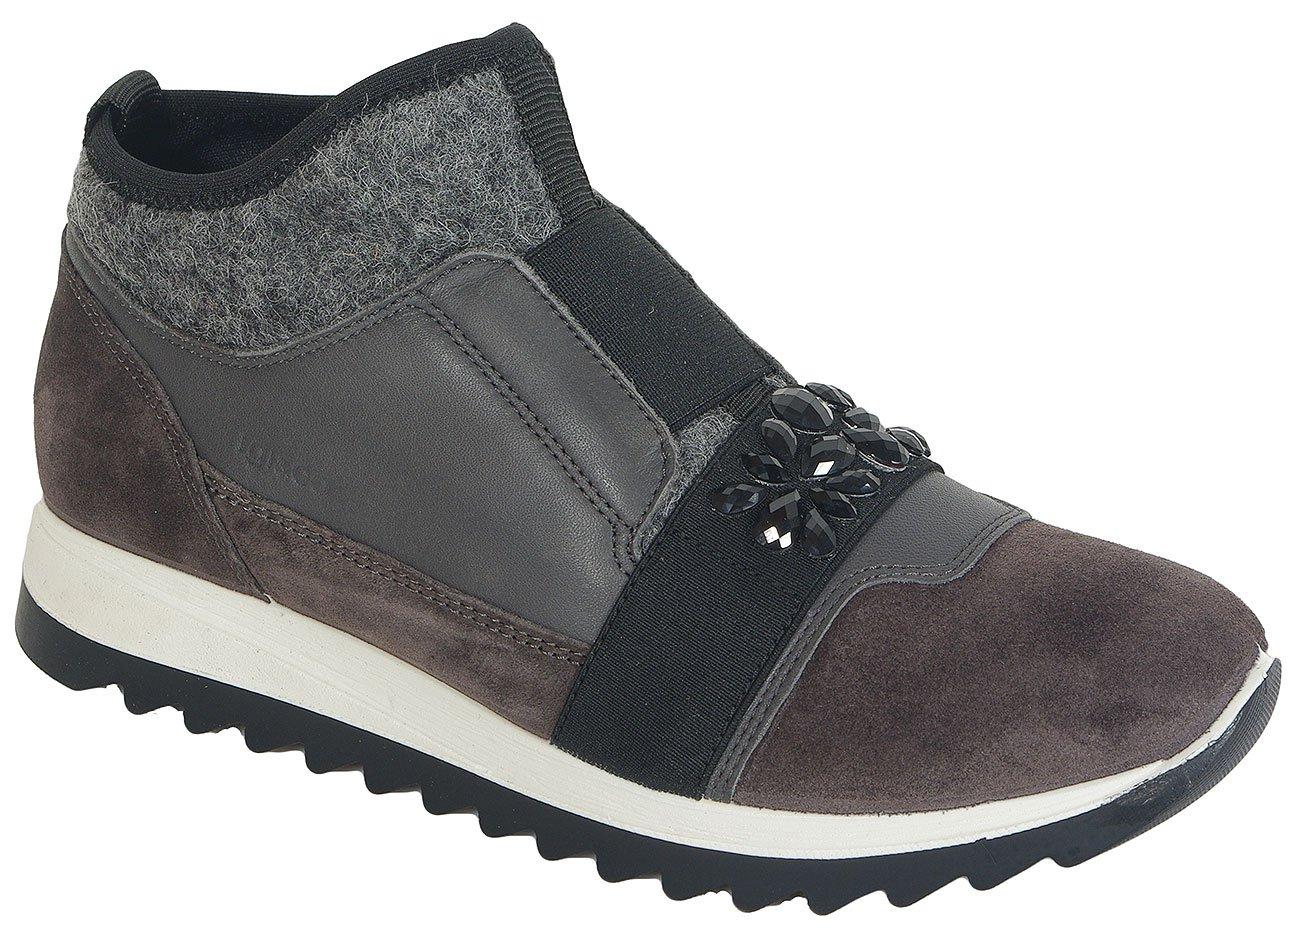 igi&co Eden Nappa Vel Grigio sneakers